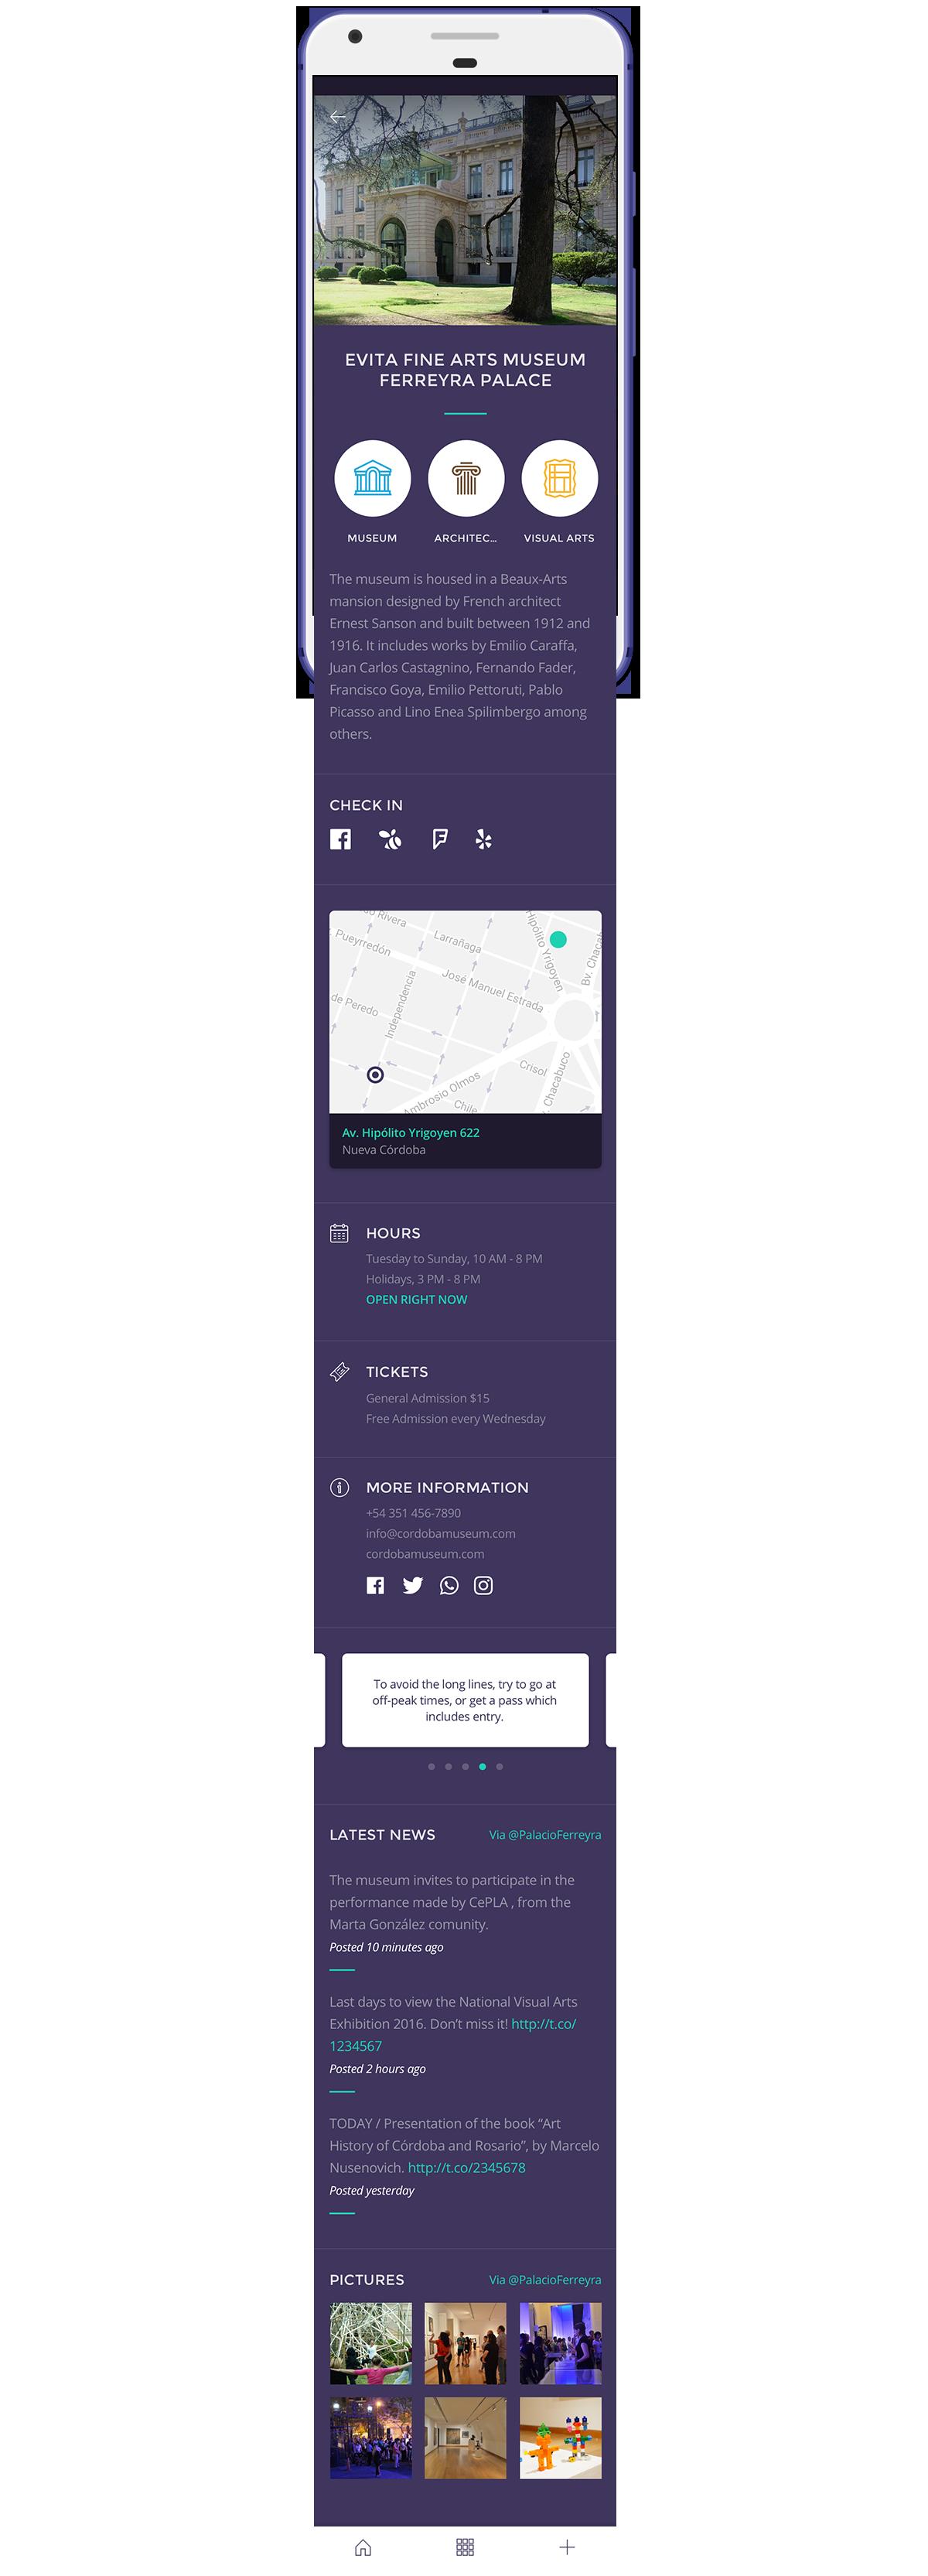 app tourism Guide city material design flat line icons icons argentina smart city